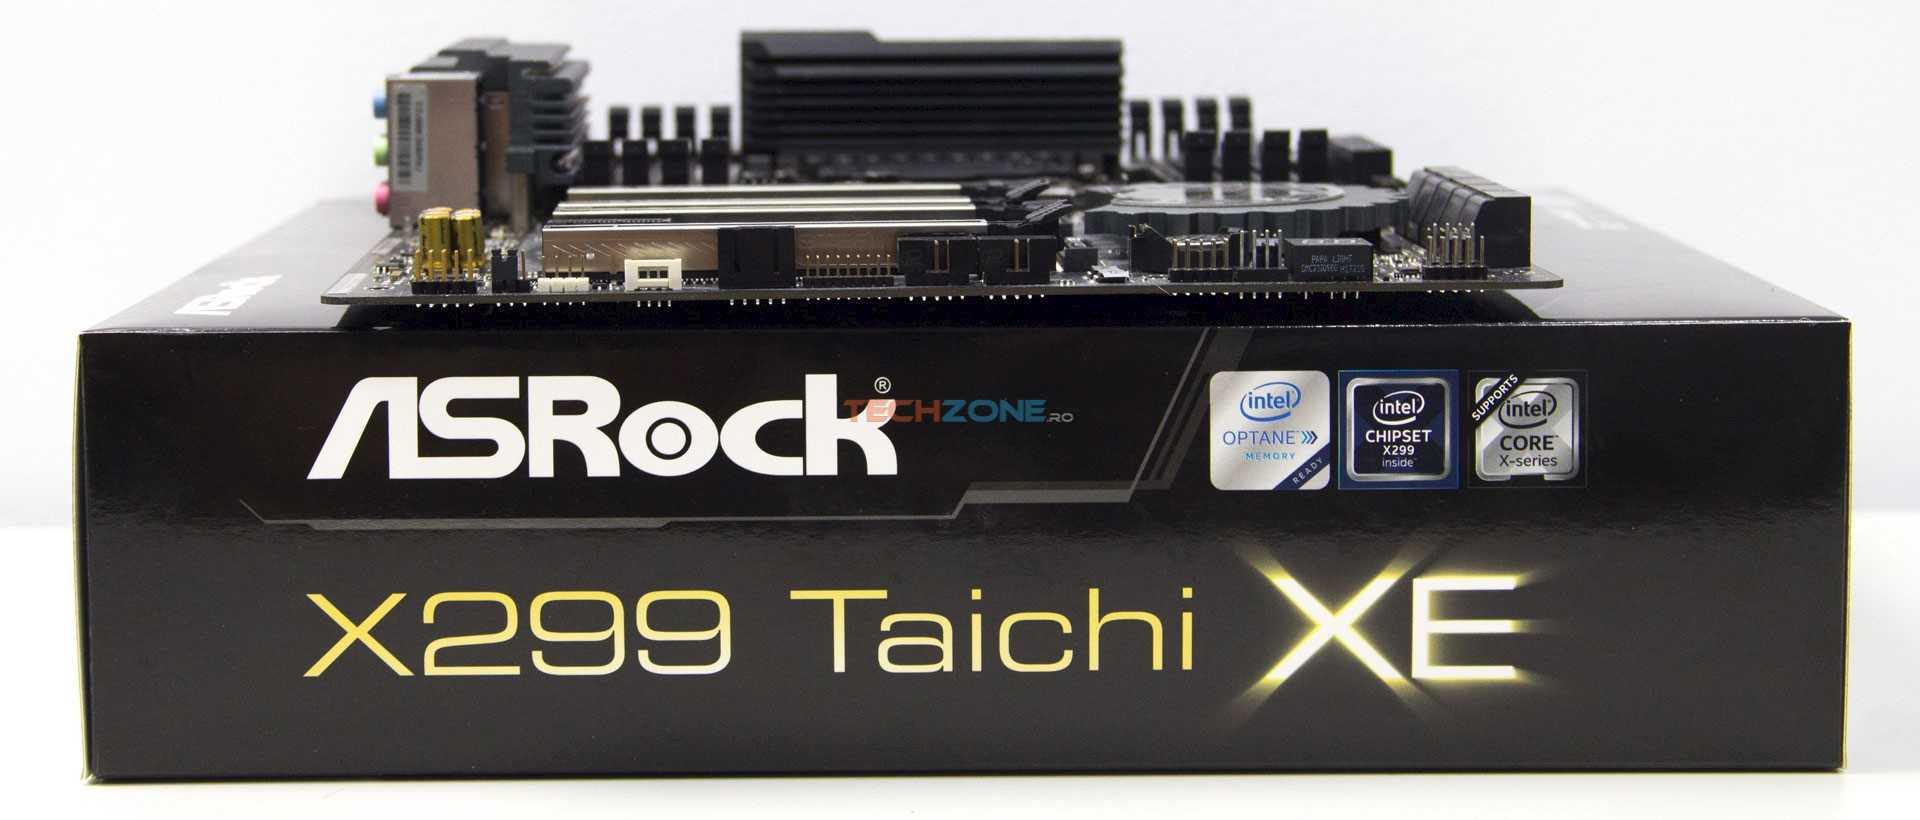 ASRock X299 Taichi XE set